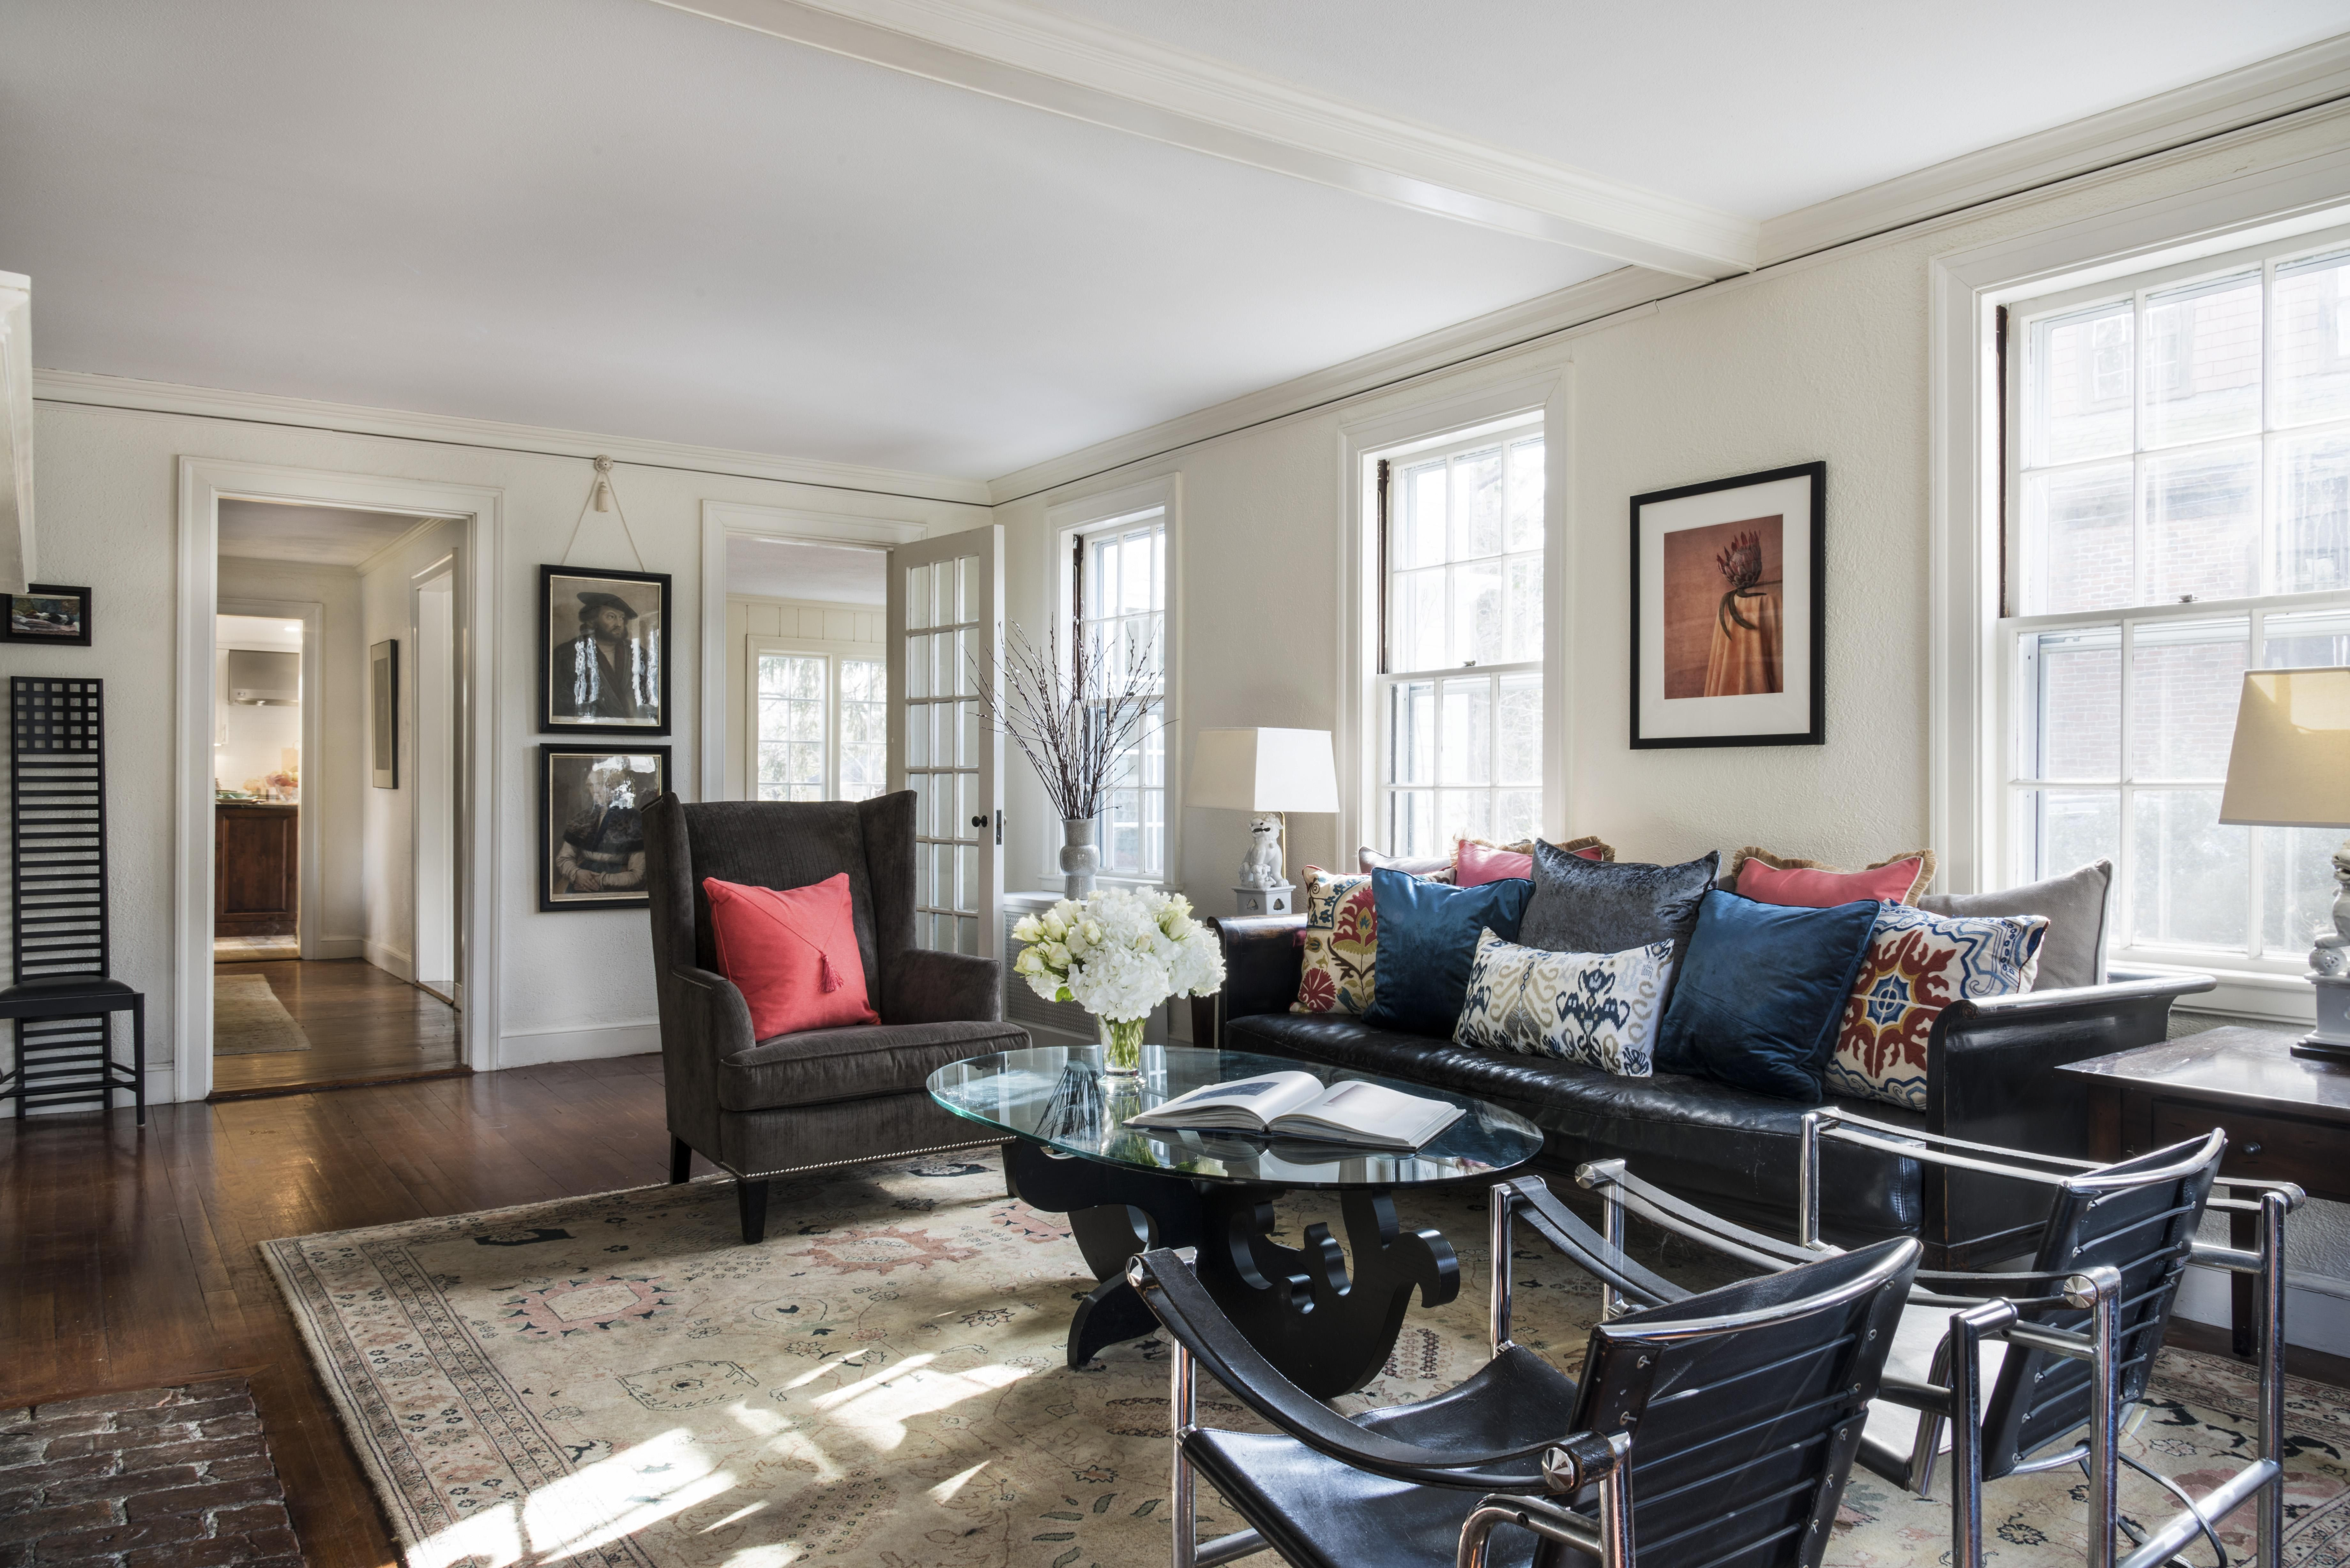 Quaint New England Living Room [288 x 288] http://ift.tt/28C28SrjN